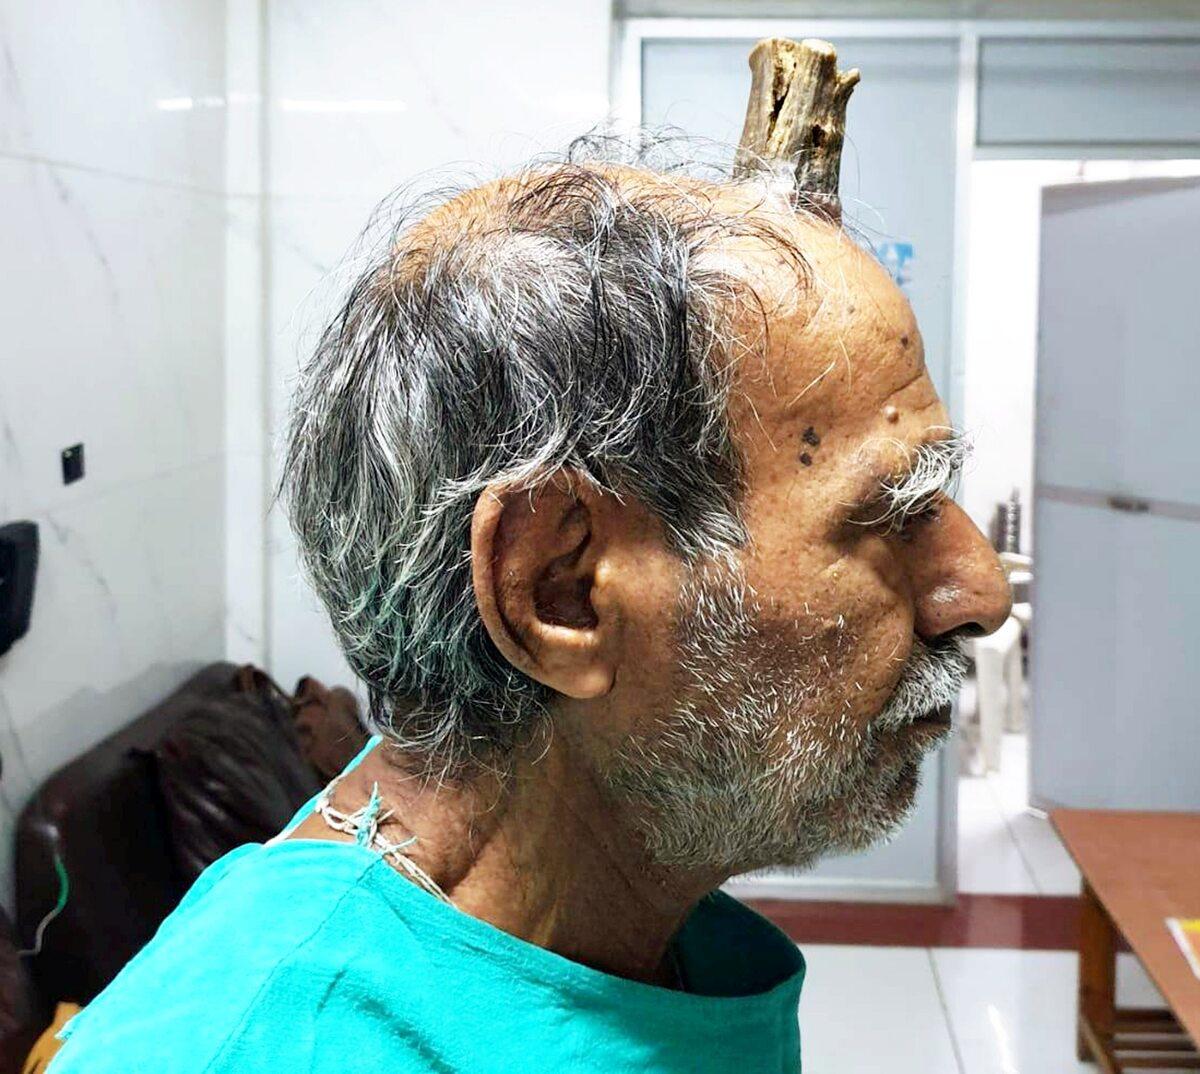 Hindus Shyam Lal Yadav miał na głowie 10 cm róg